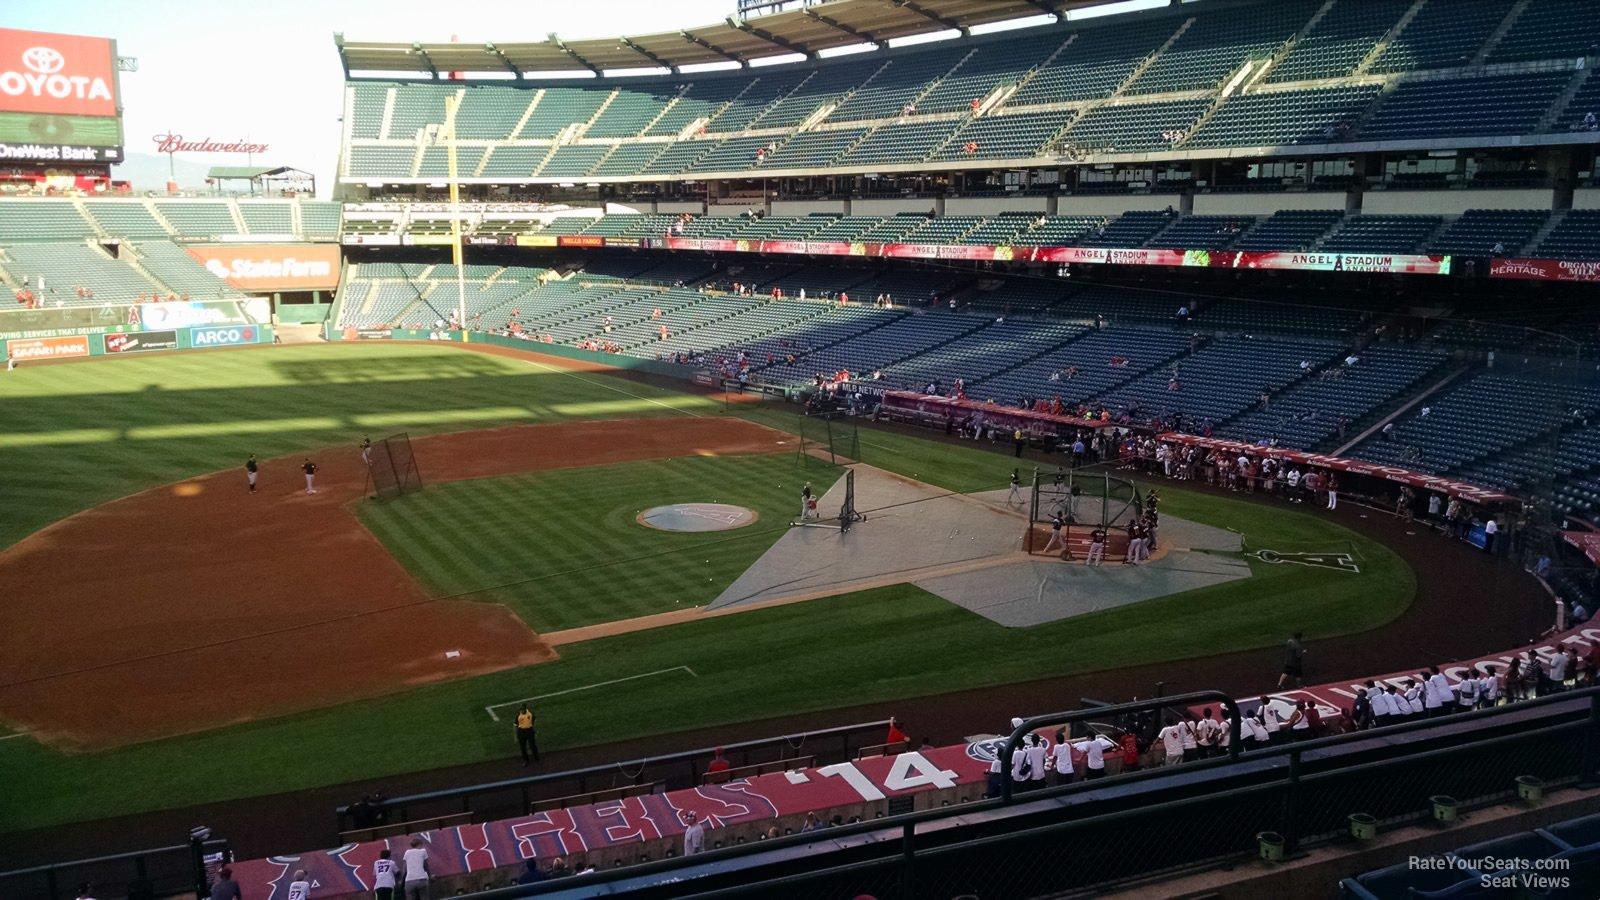 Angel Stadium Section 316 - RateYourSeats.com